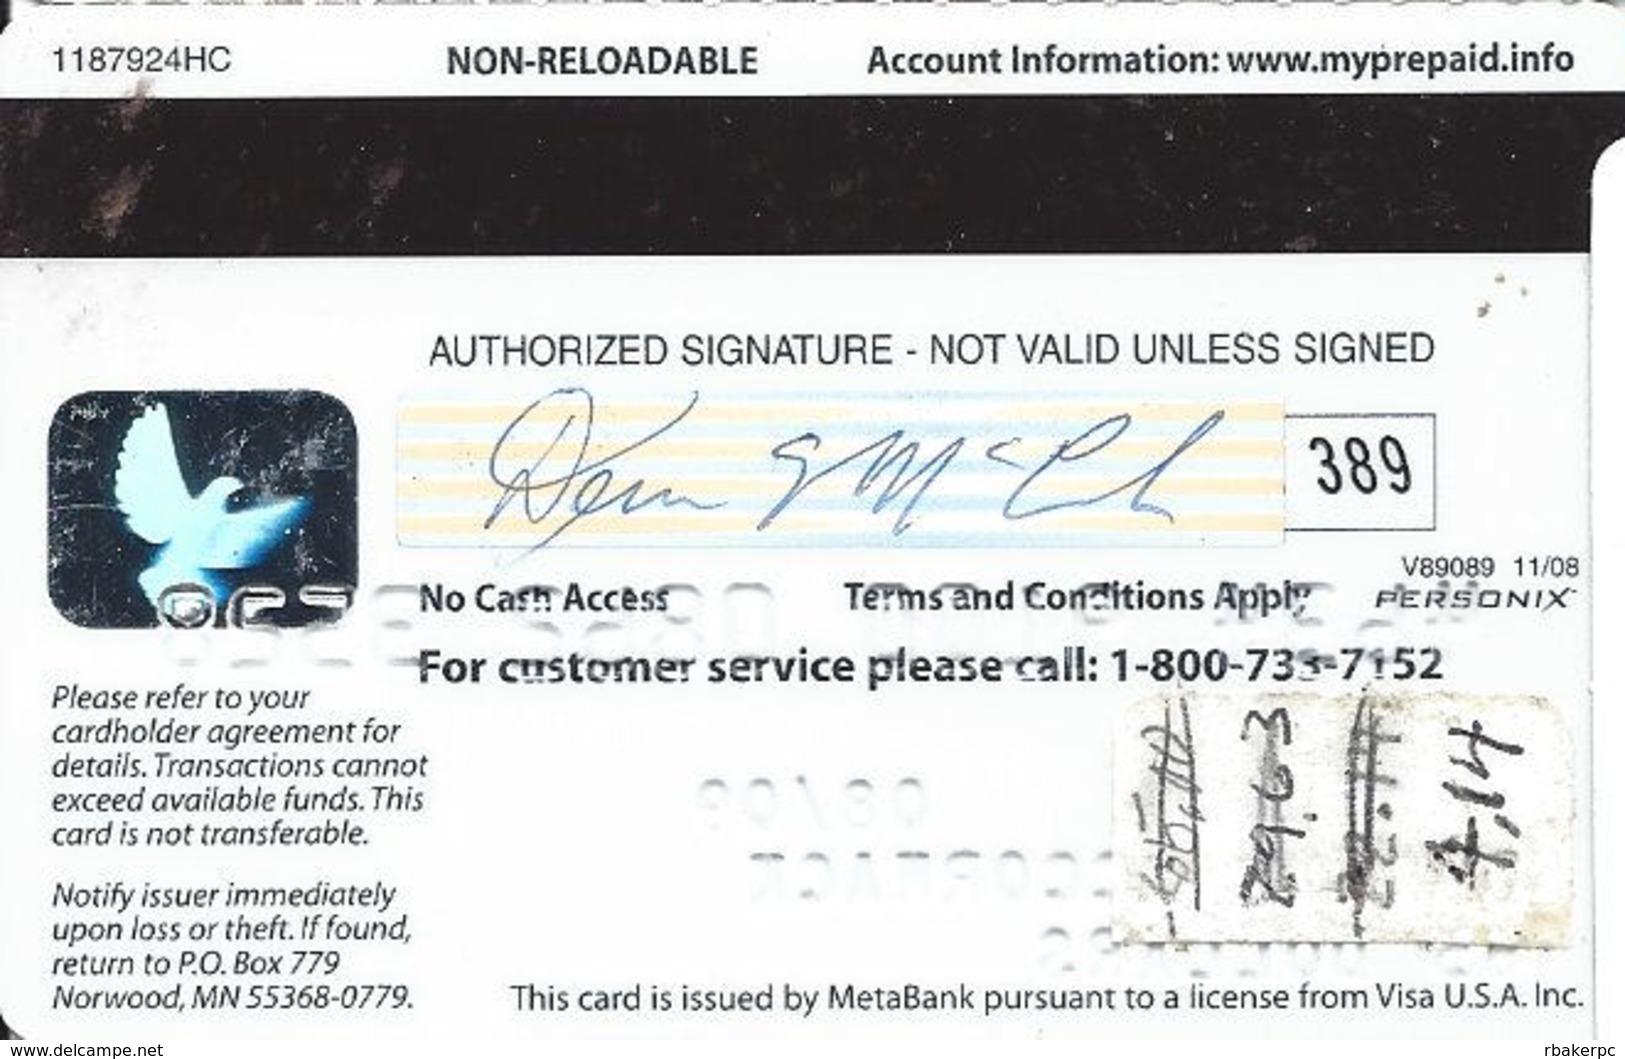 Lowe's Free Delivery Reward Card - Visa Debit Card - Gift Cards